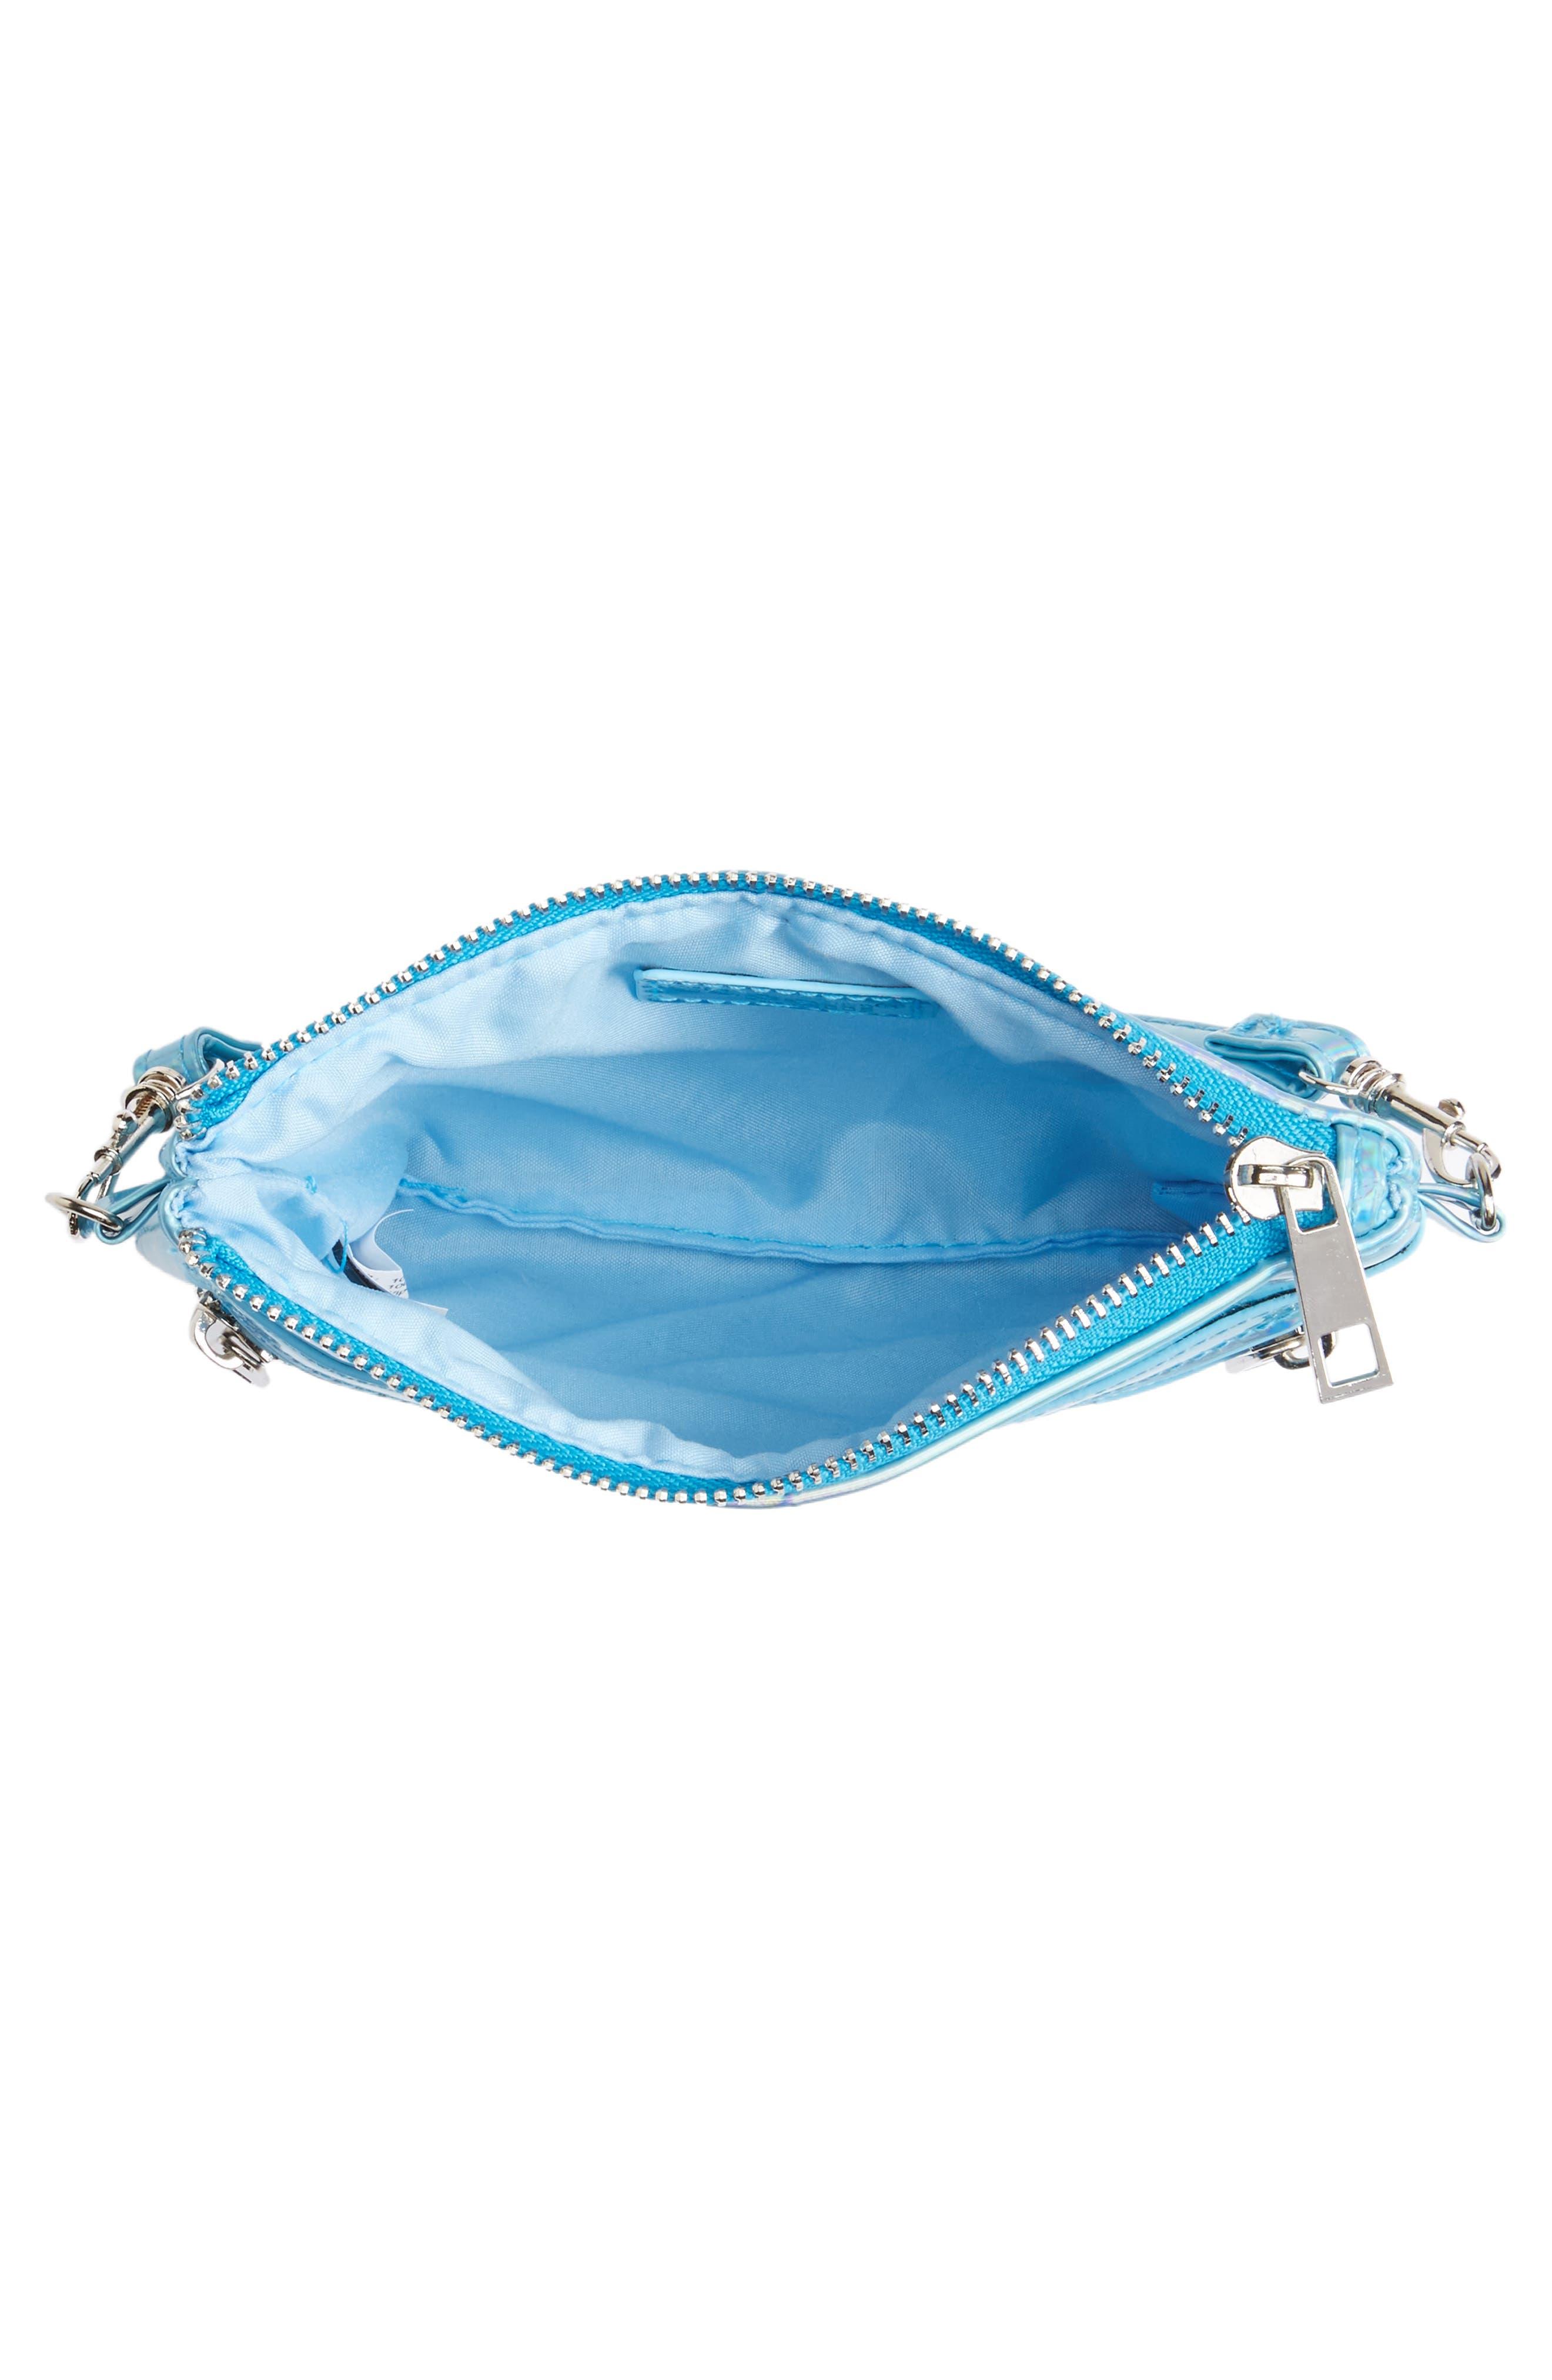 Capelli of New York Hologram Crossbody Bag,                             Alternate thumbnail 3, color,                             401